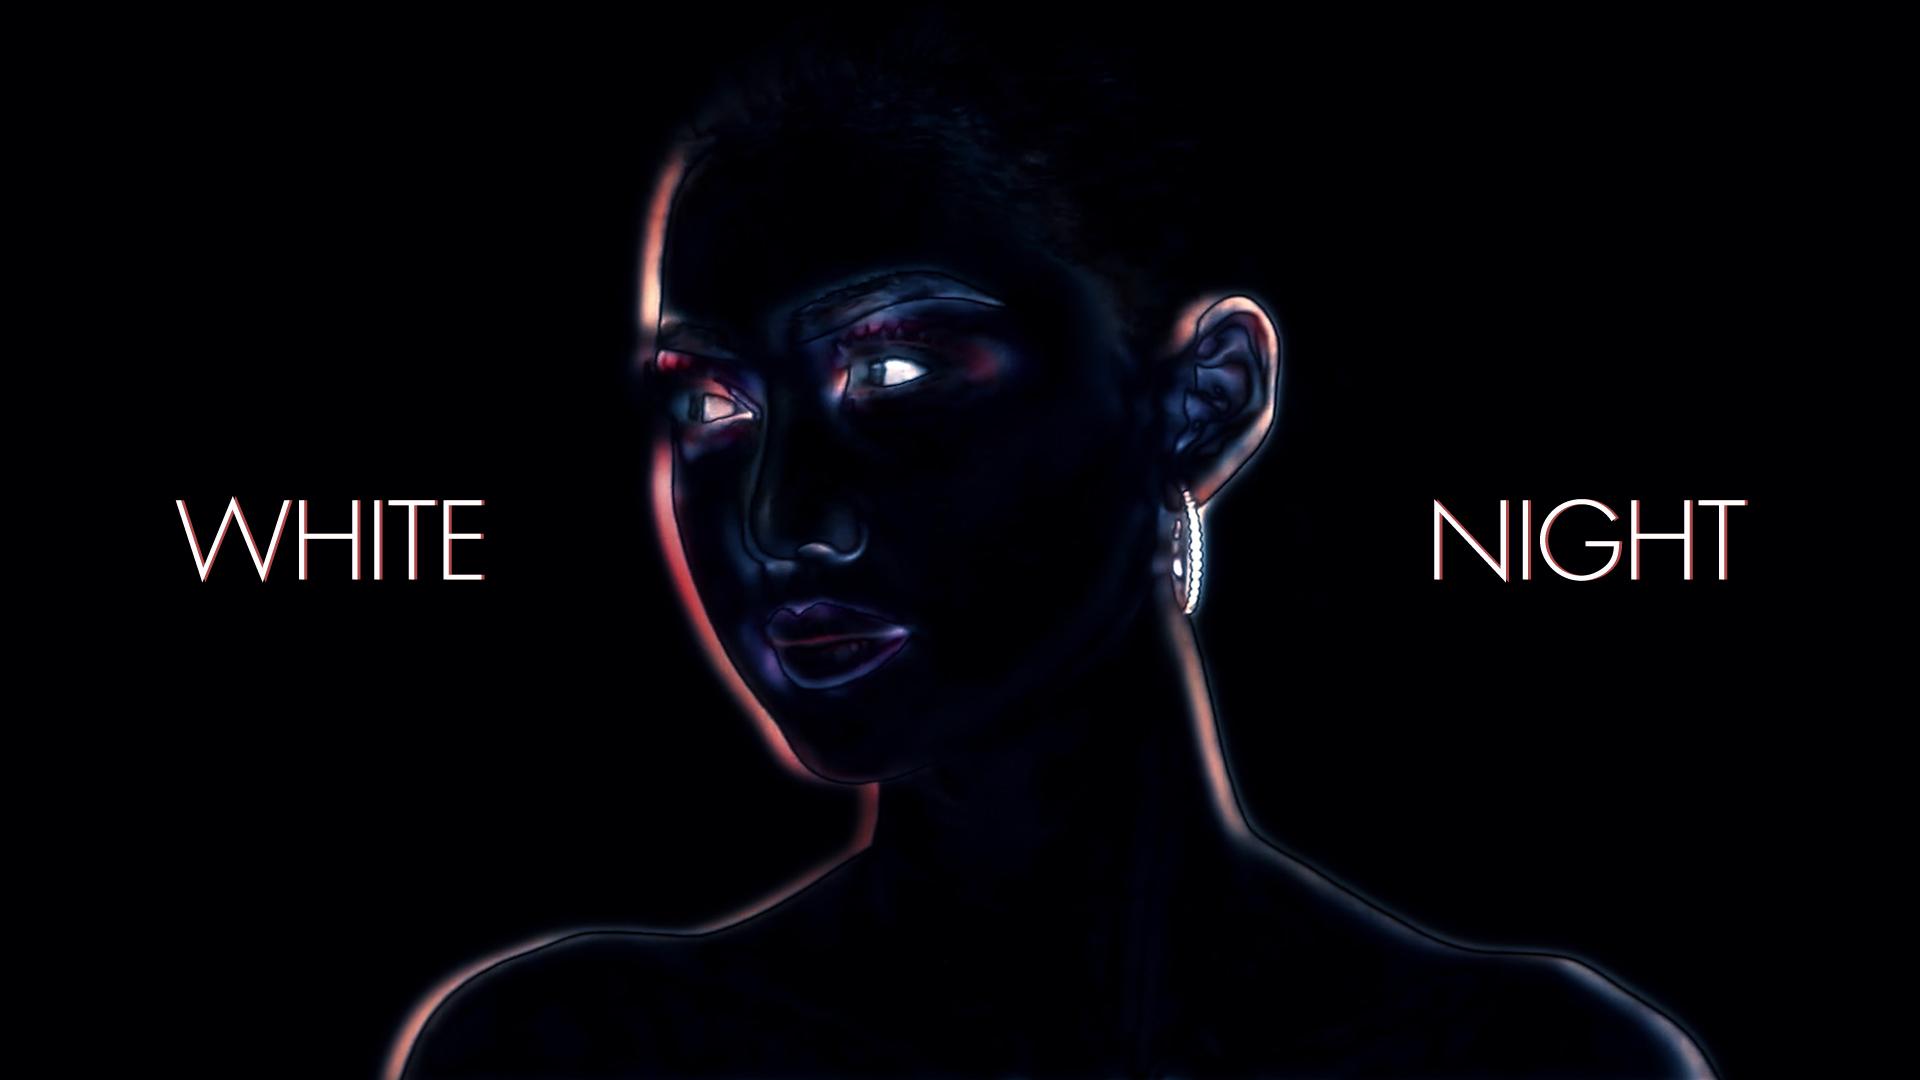 WHITE NIGHT Vimeo Poster xx